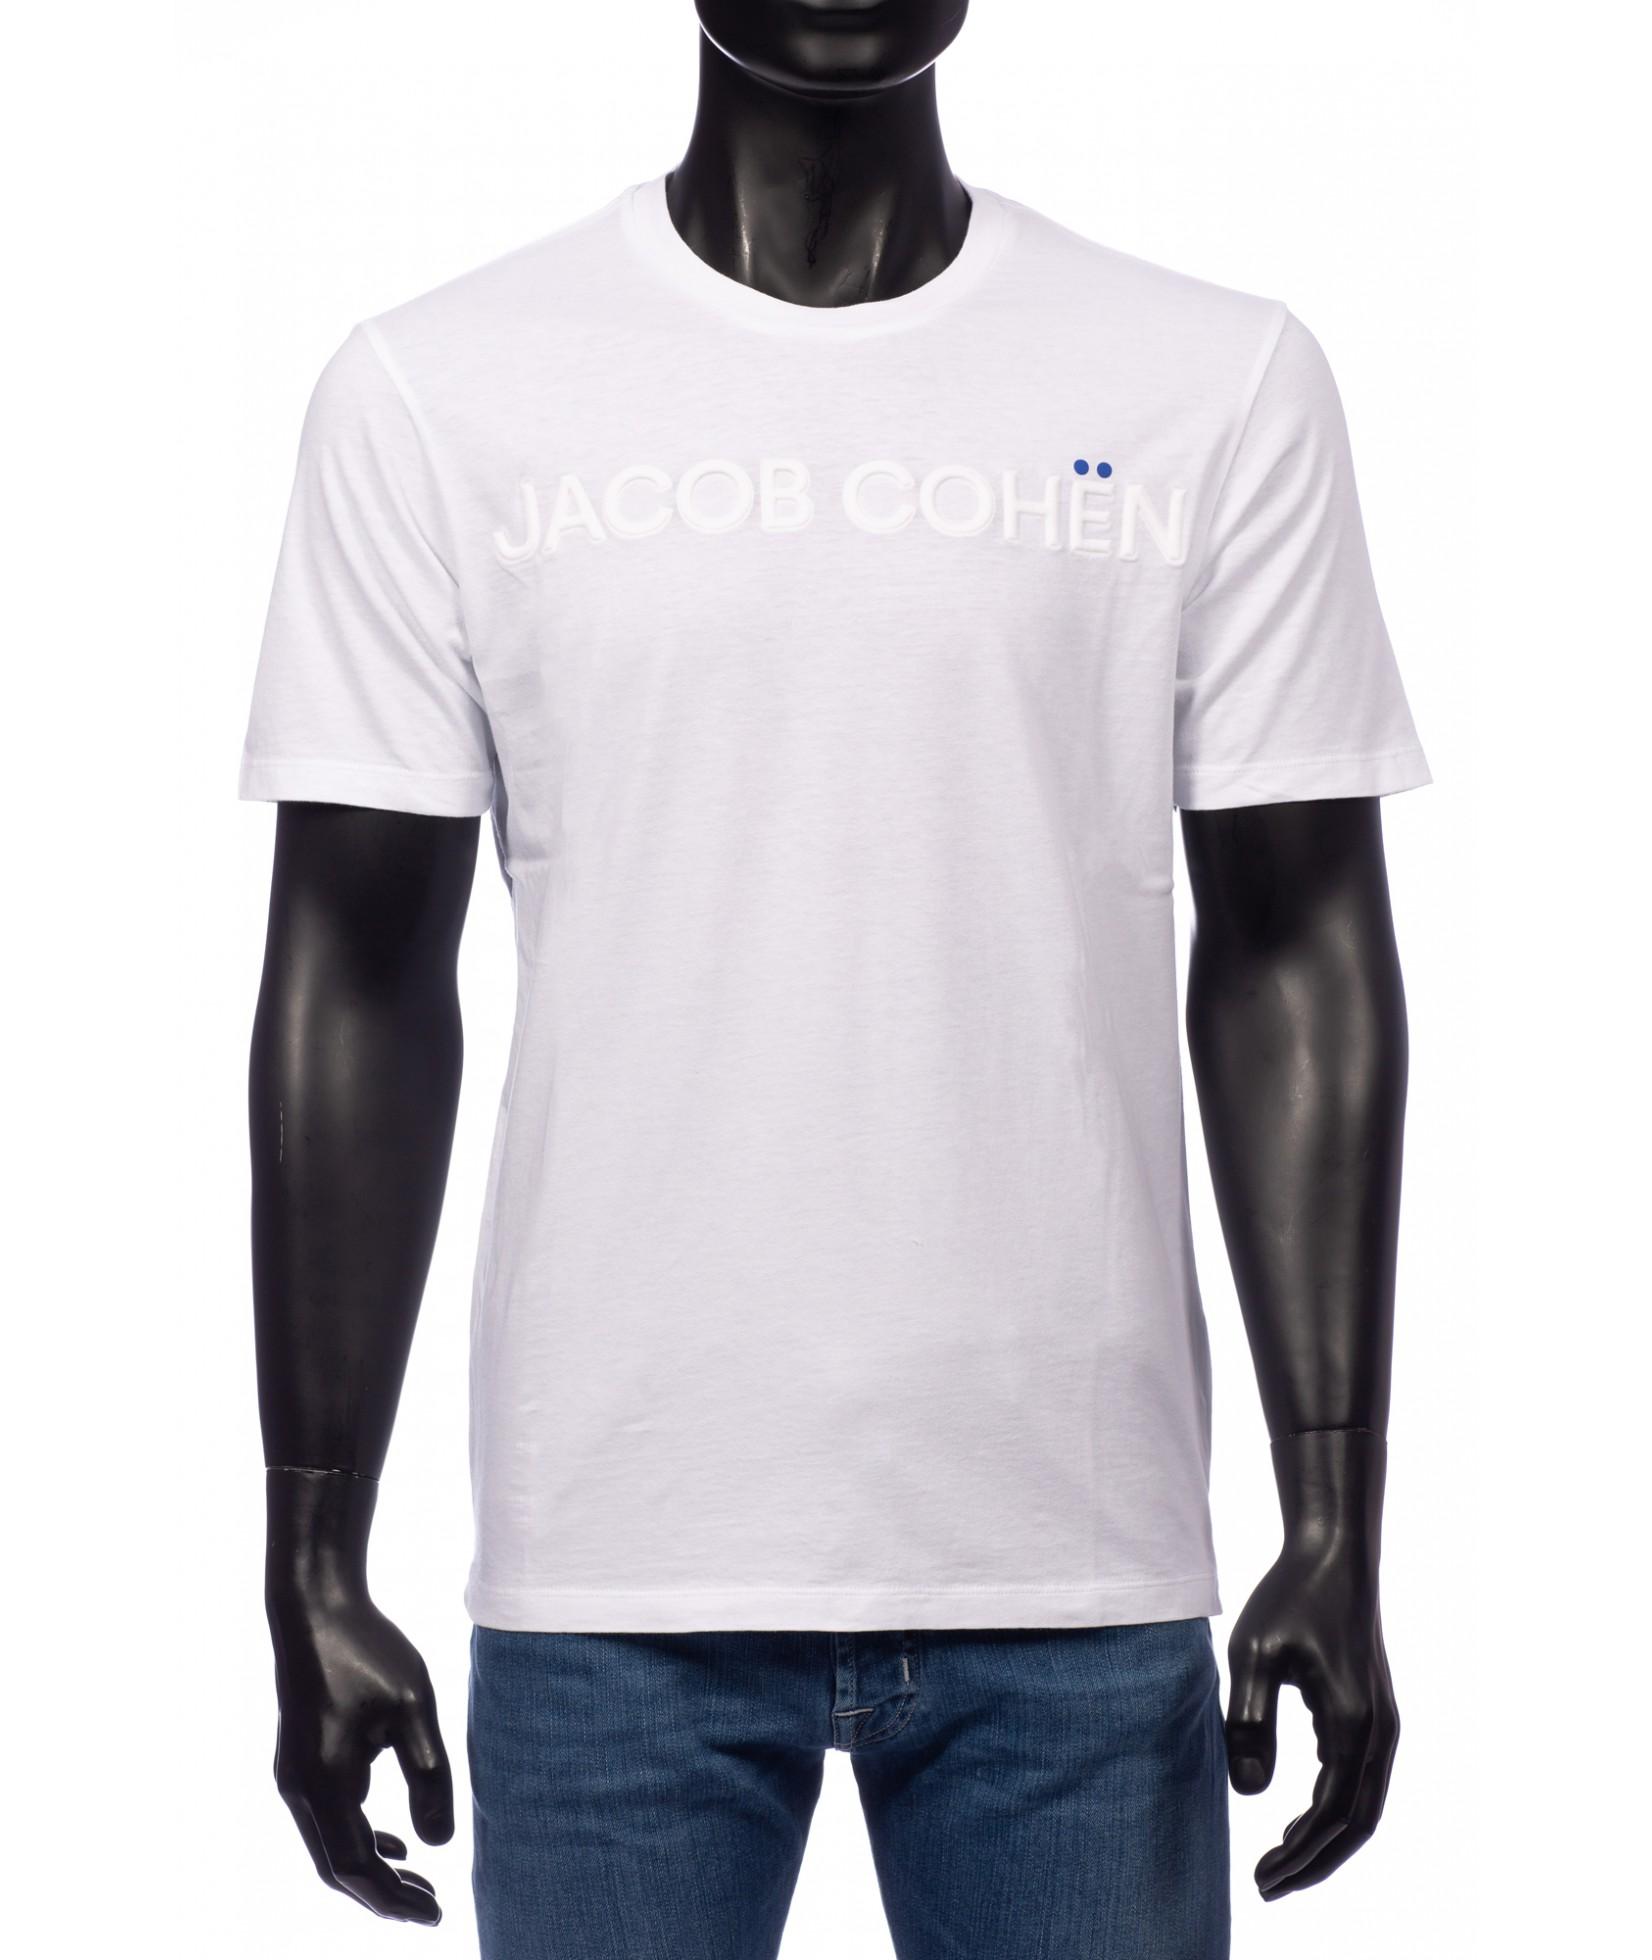 Jacob Cohen T-Shirt Weiß (32331)